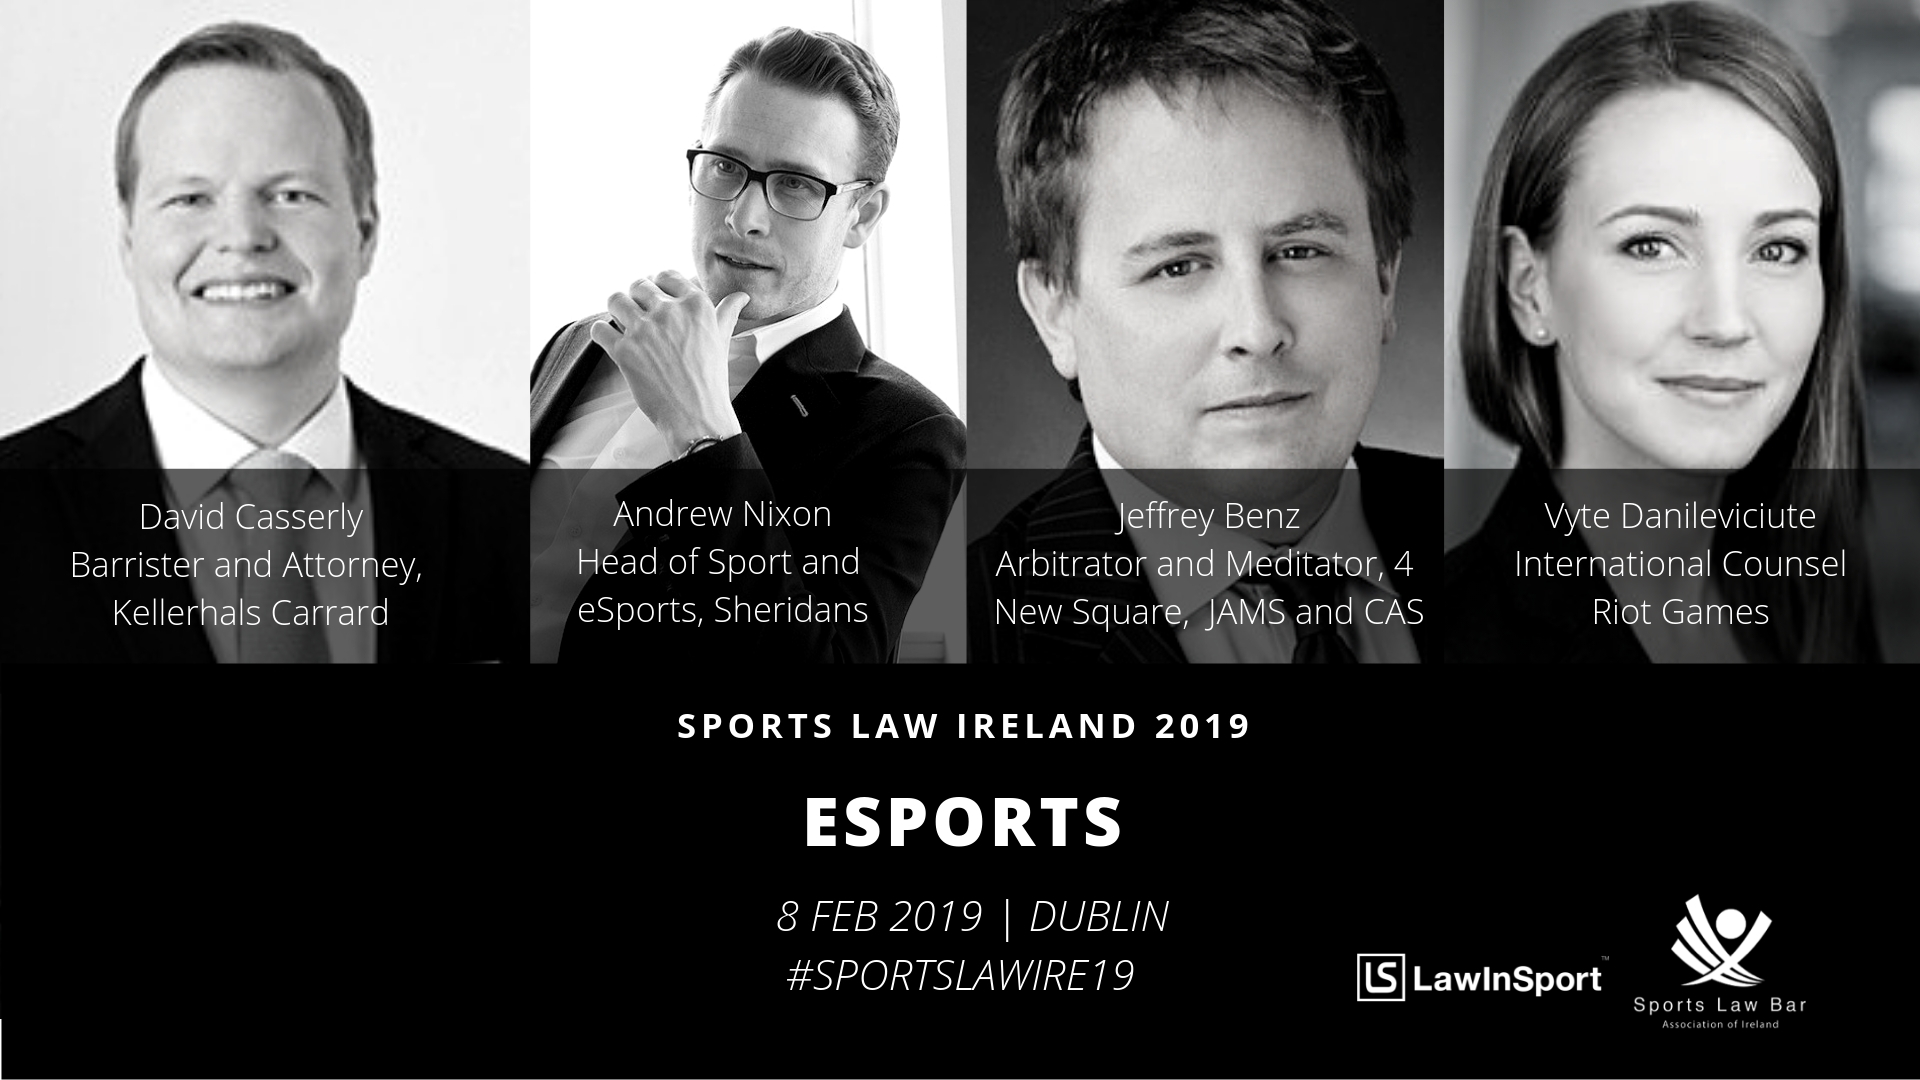 eSports Panel Speakers at Sports Law Ireland 19